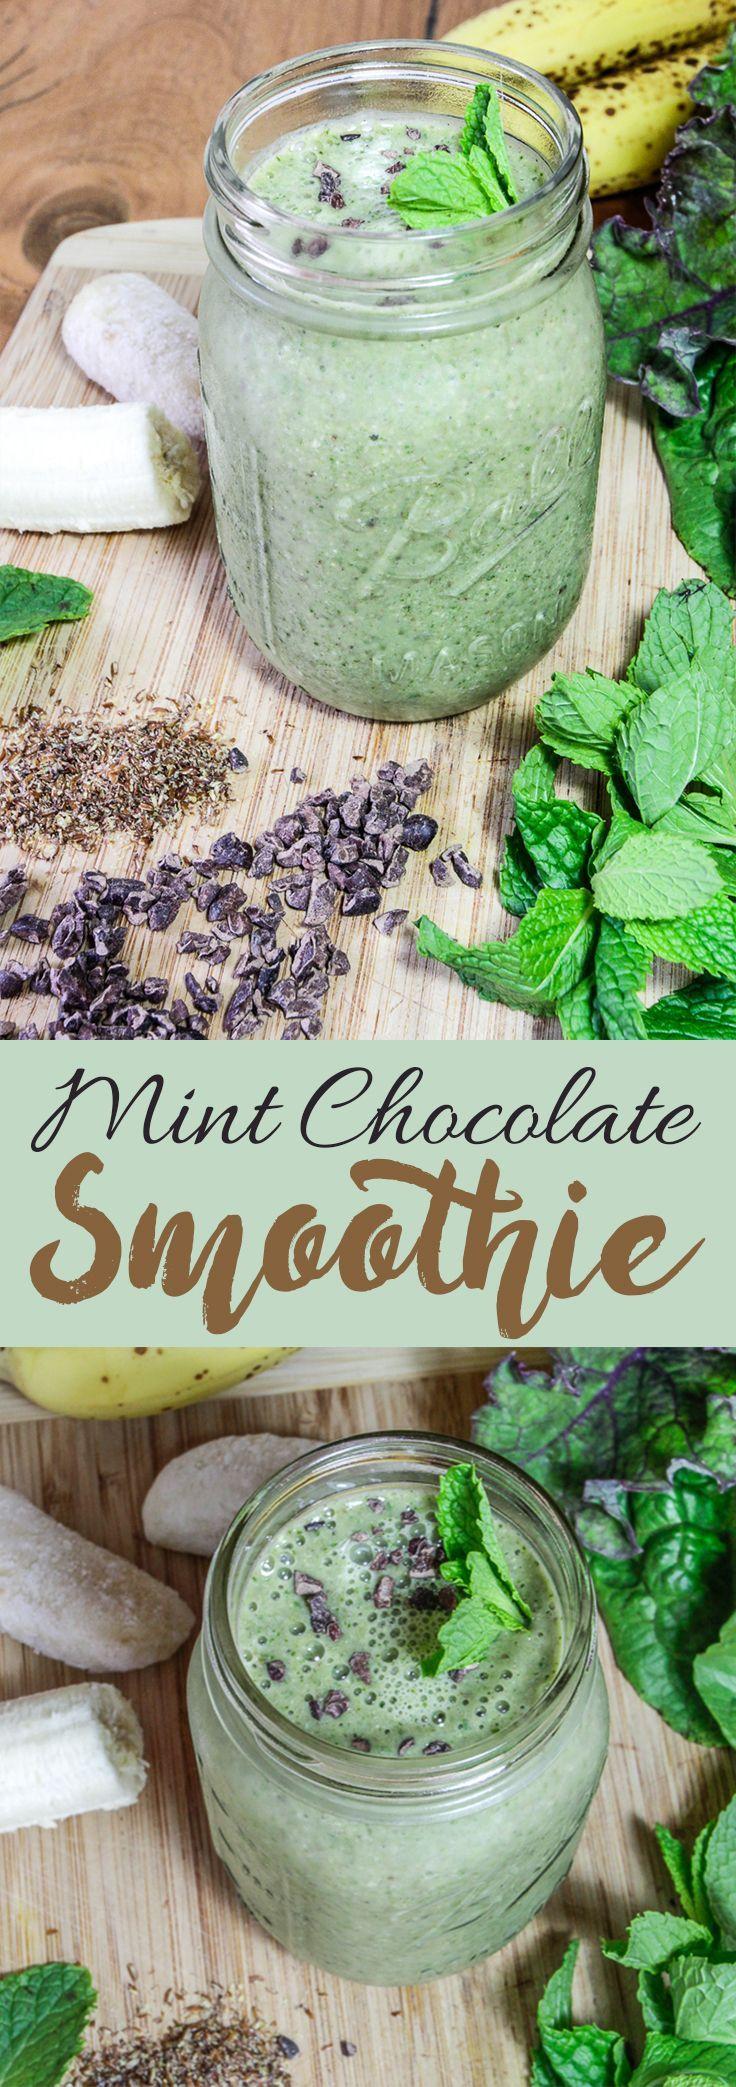 Mint Chocolate Smoothie